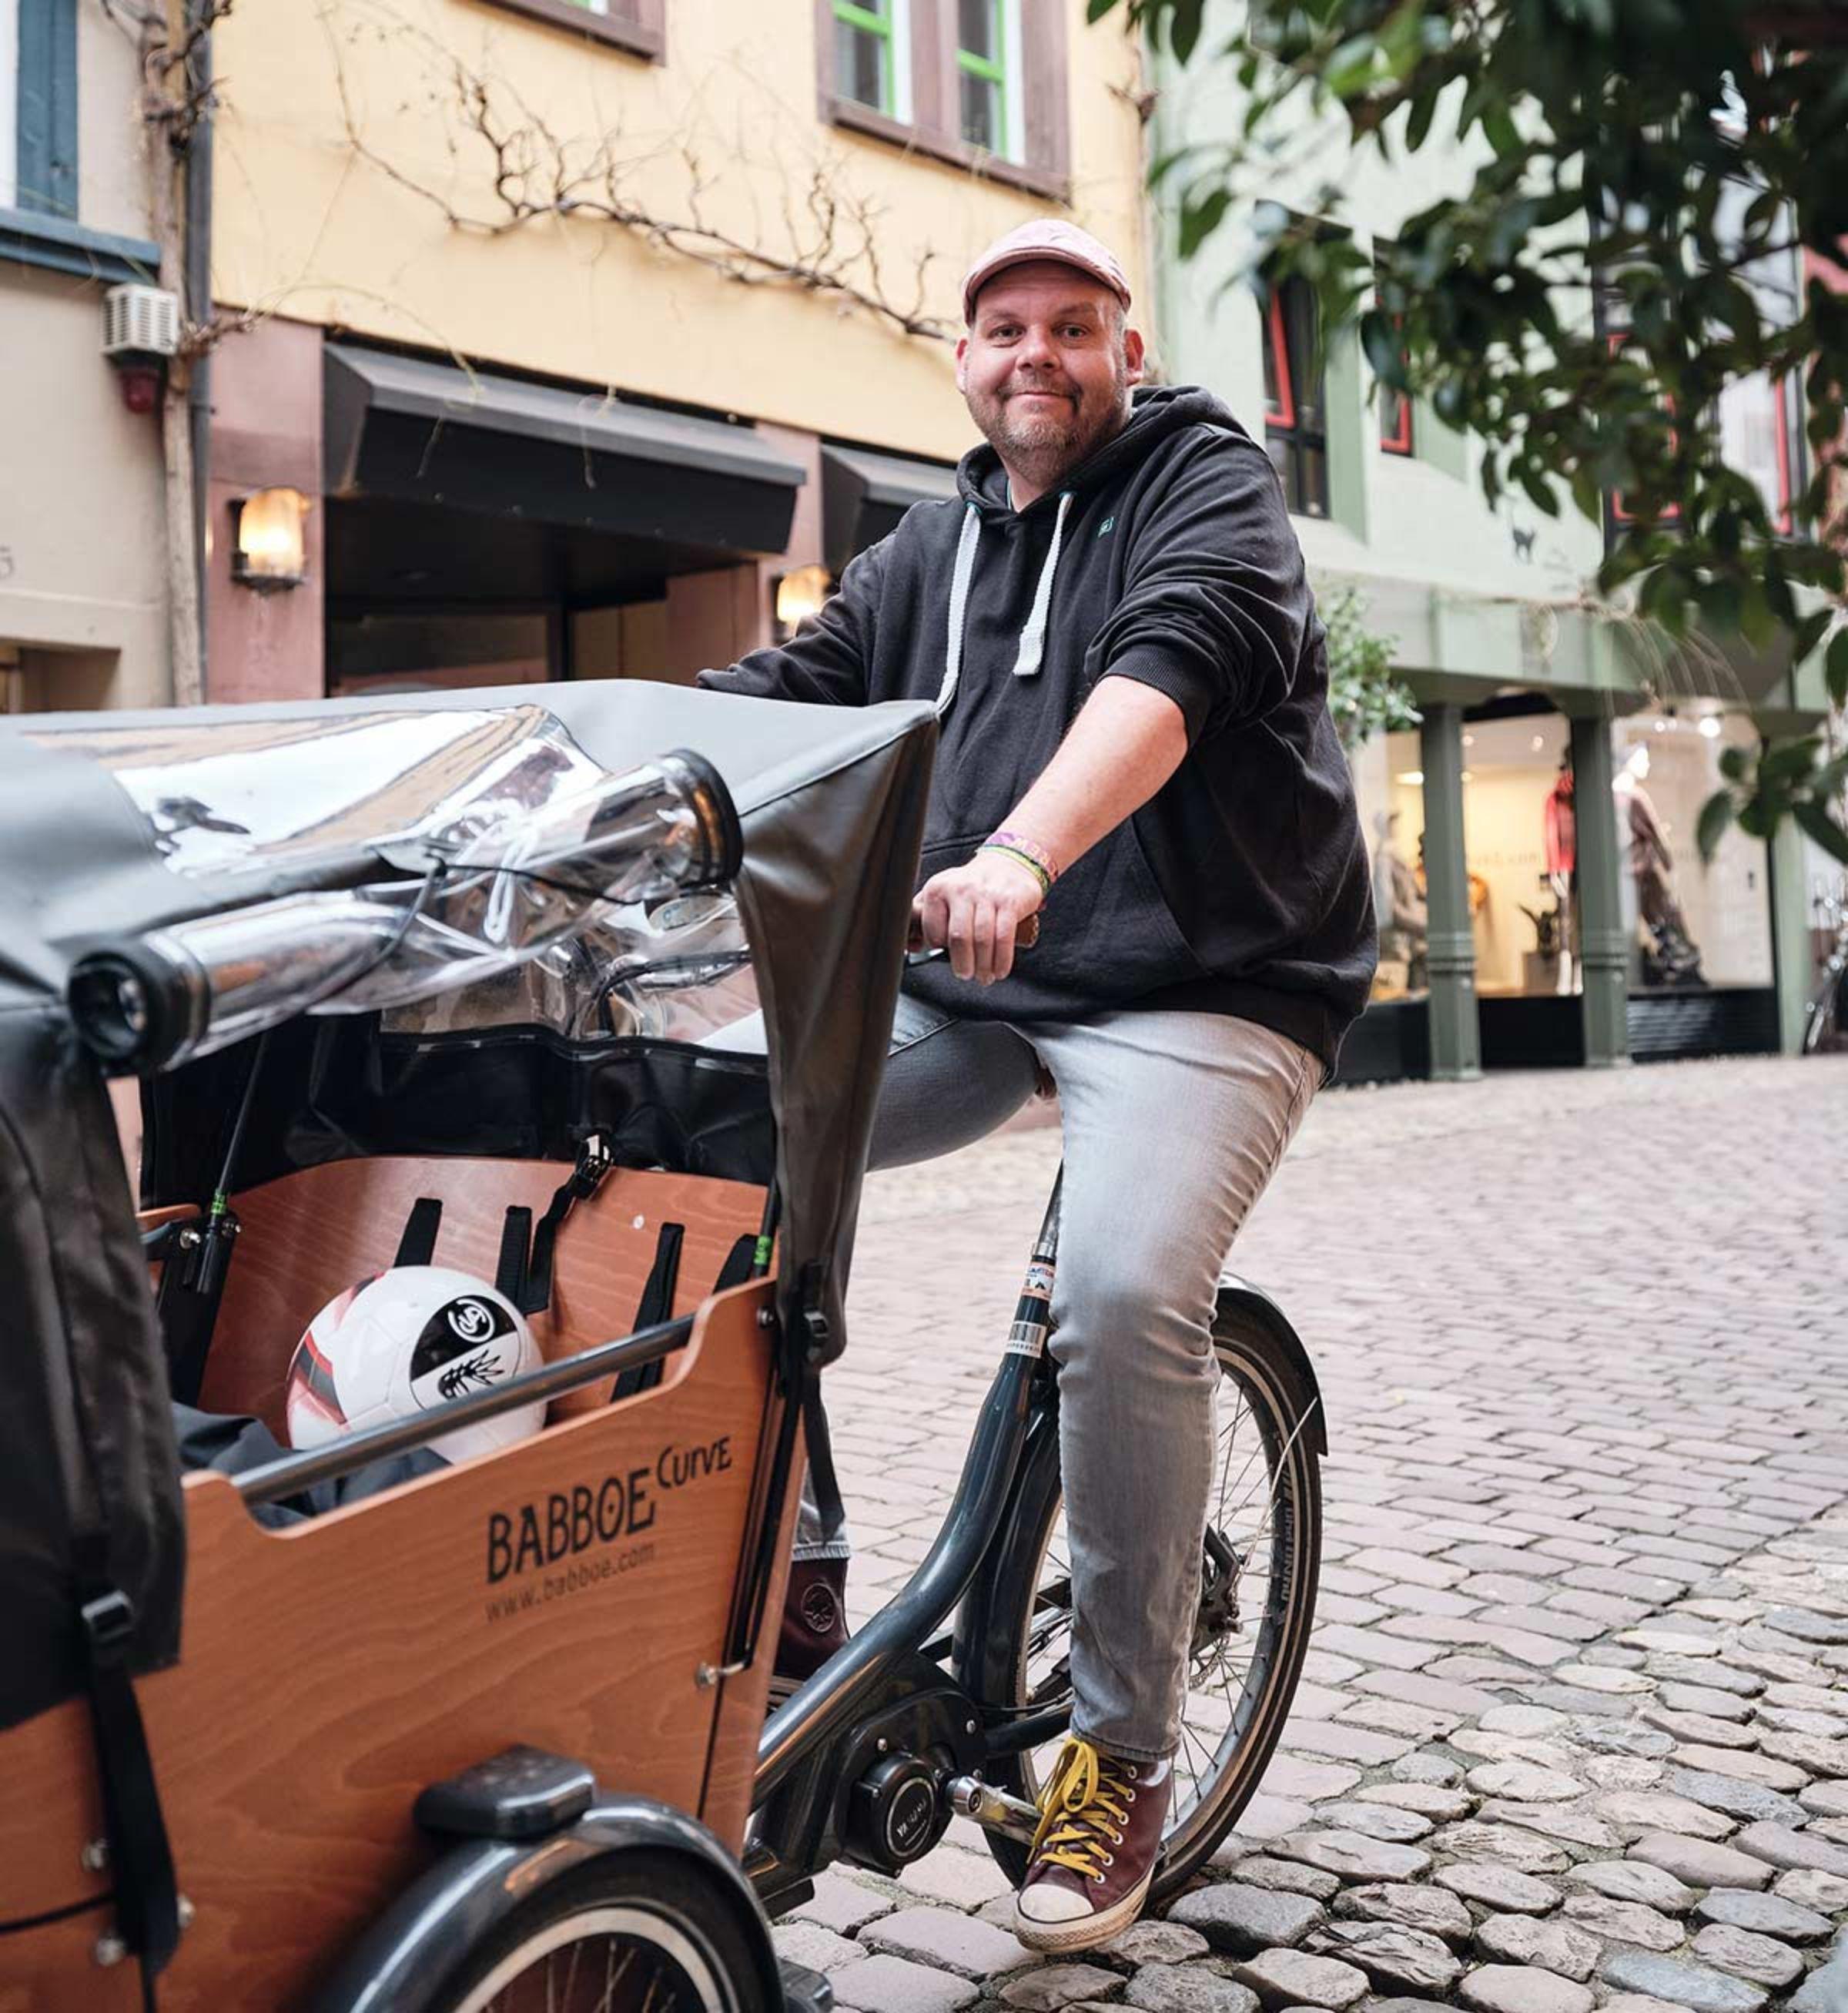 JobRadler Philipp Spitczok von Brisinski auf seinem Cargobike